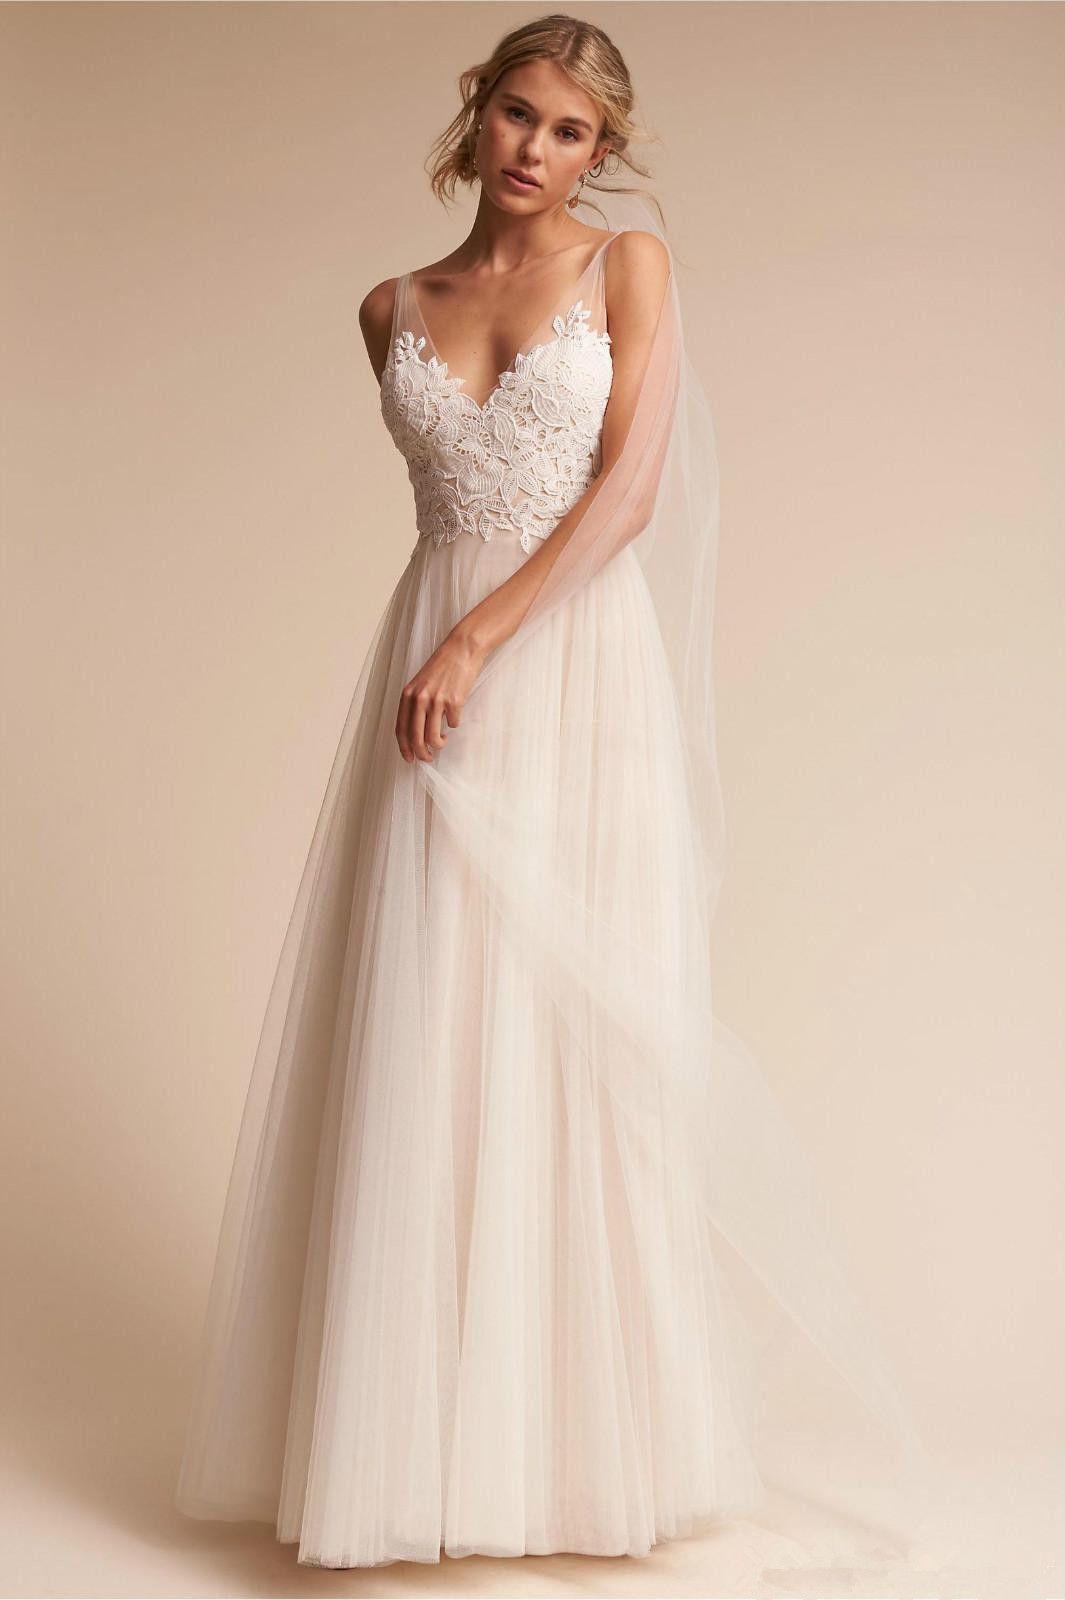 Sheer Wedding Dress Material